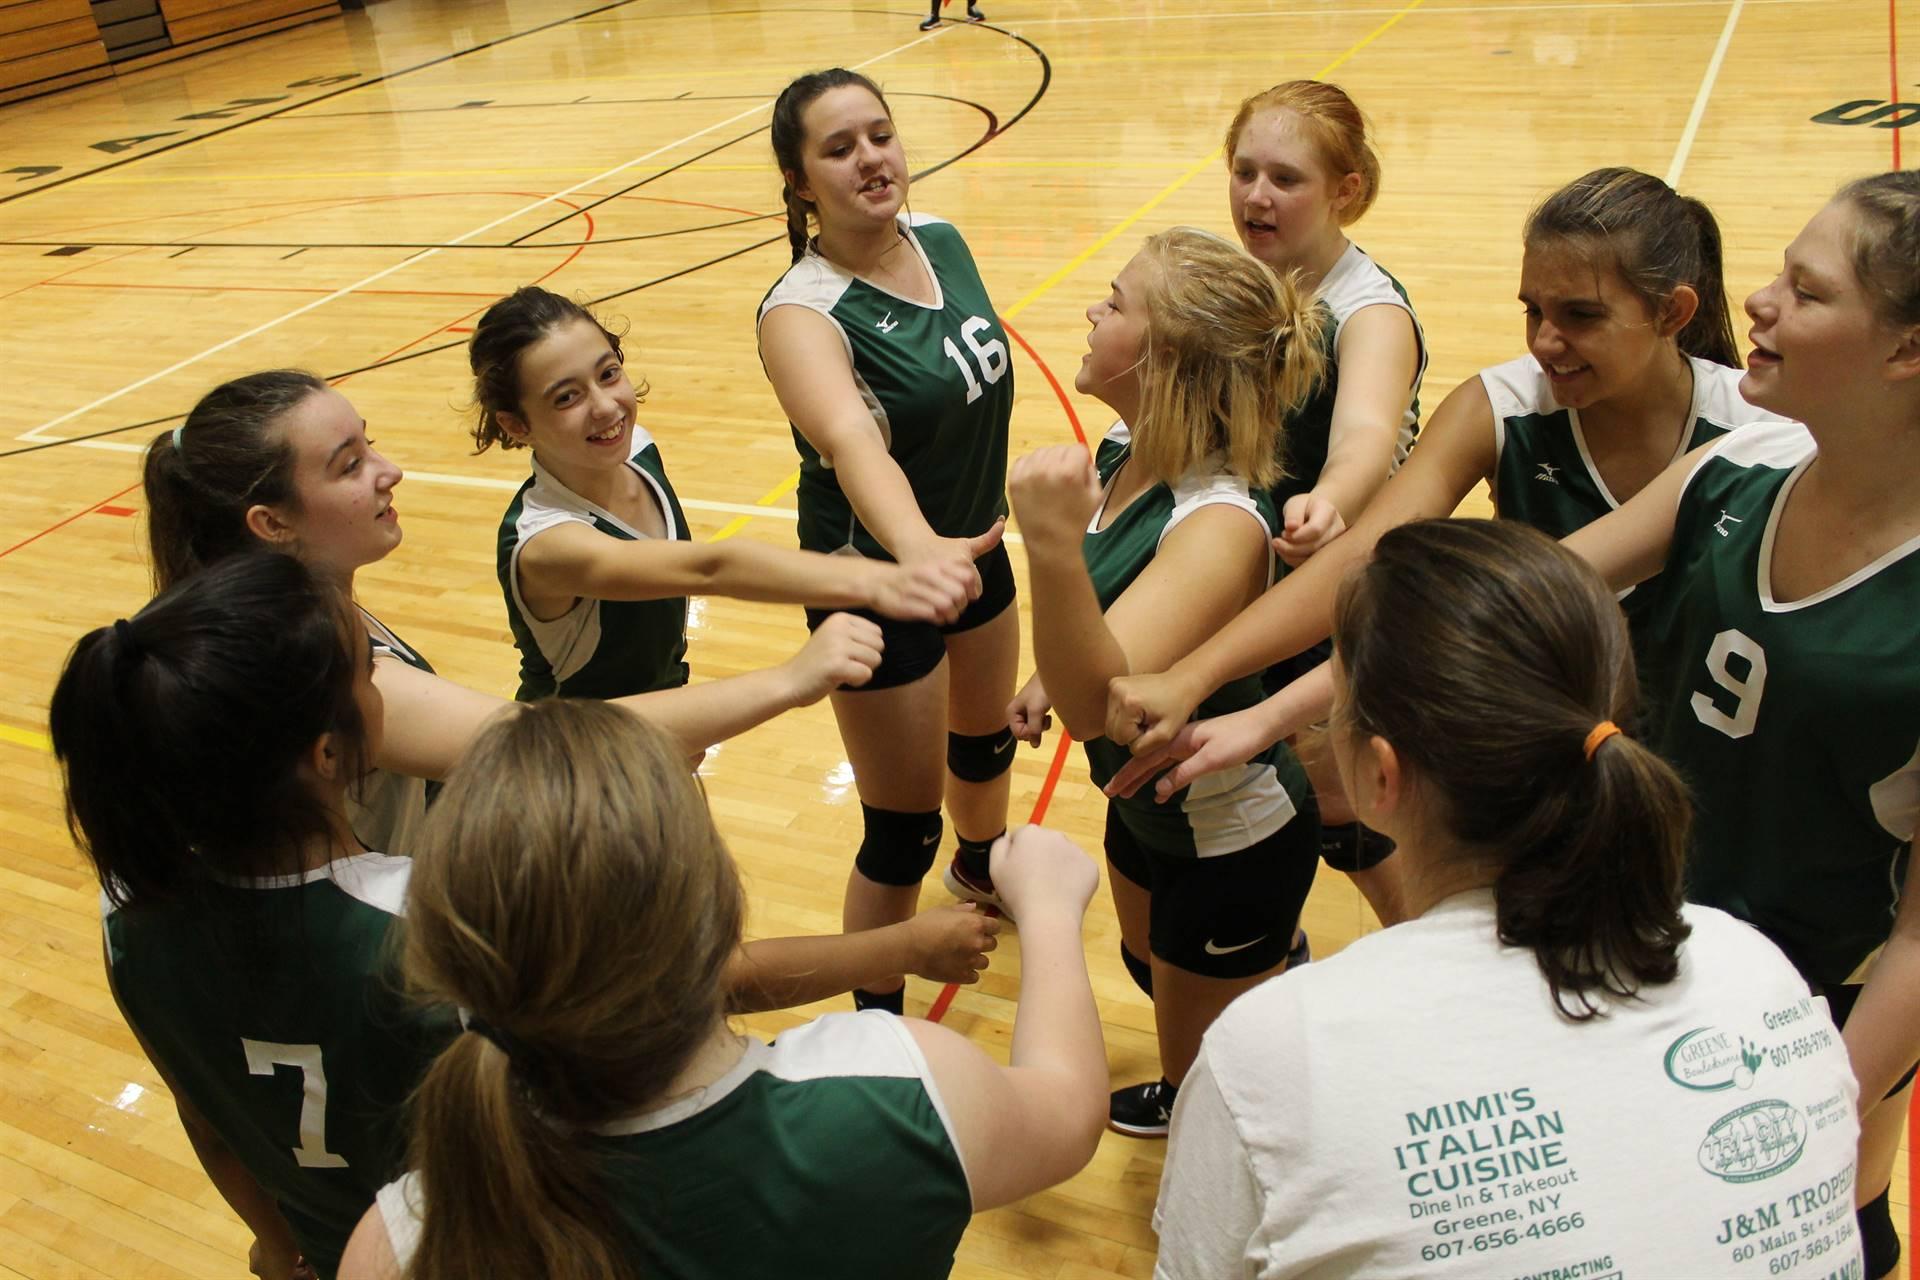 Girls Volley Ball Team Cheering